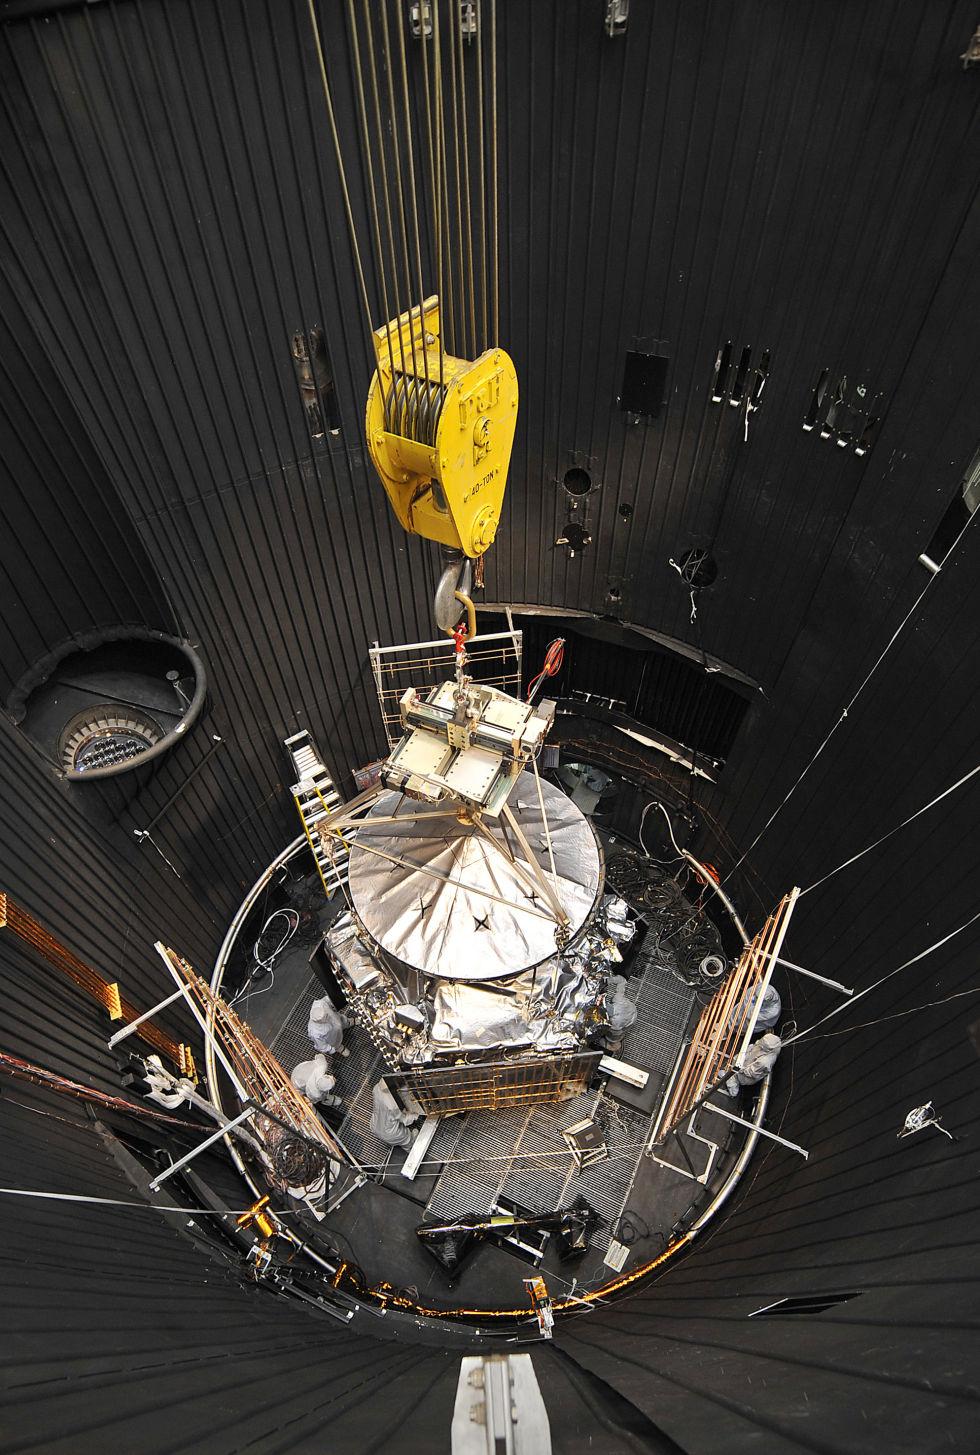 juno spacecraft - photo #30